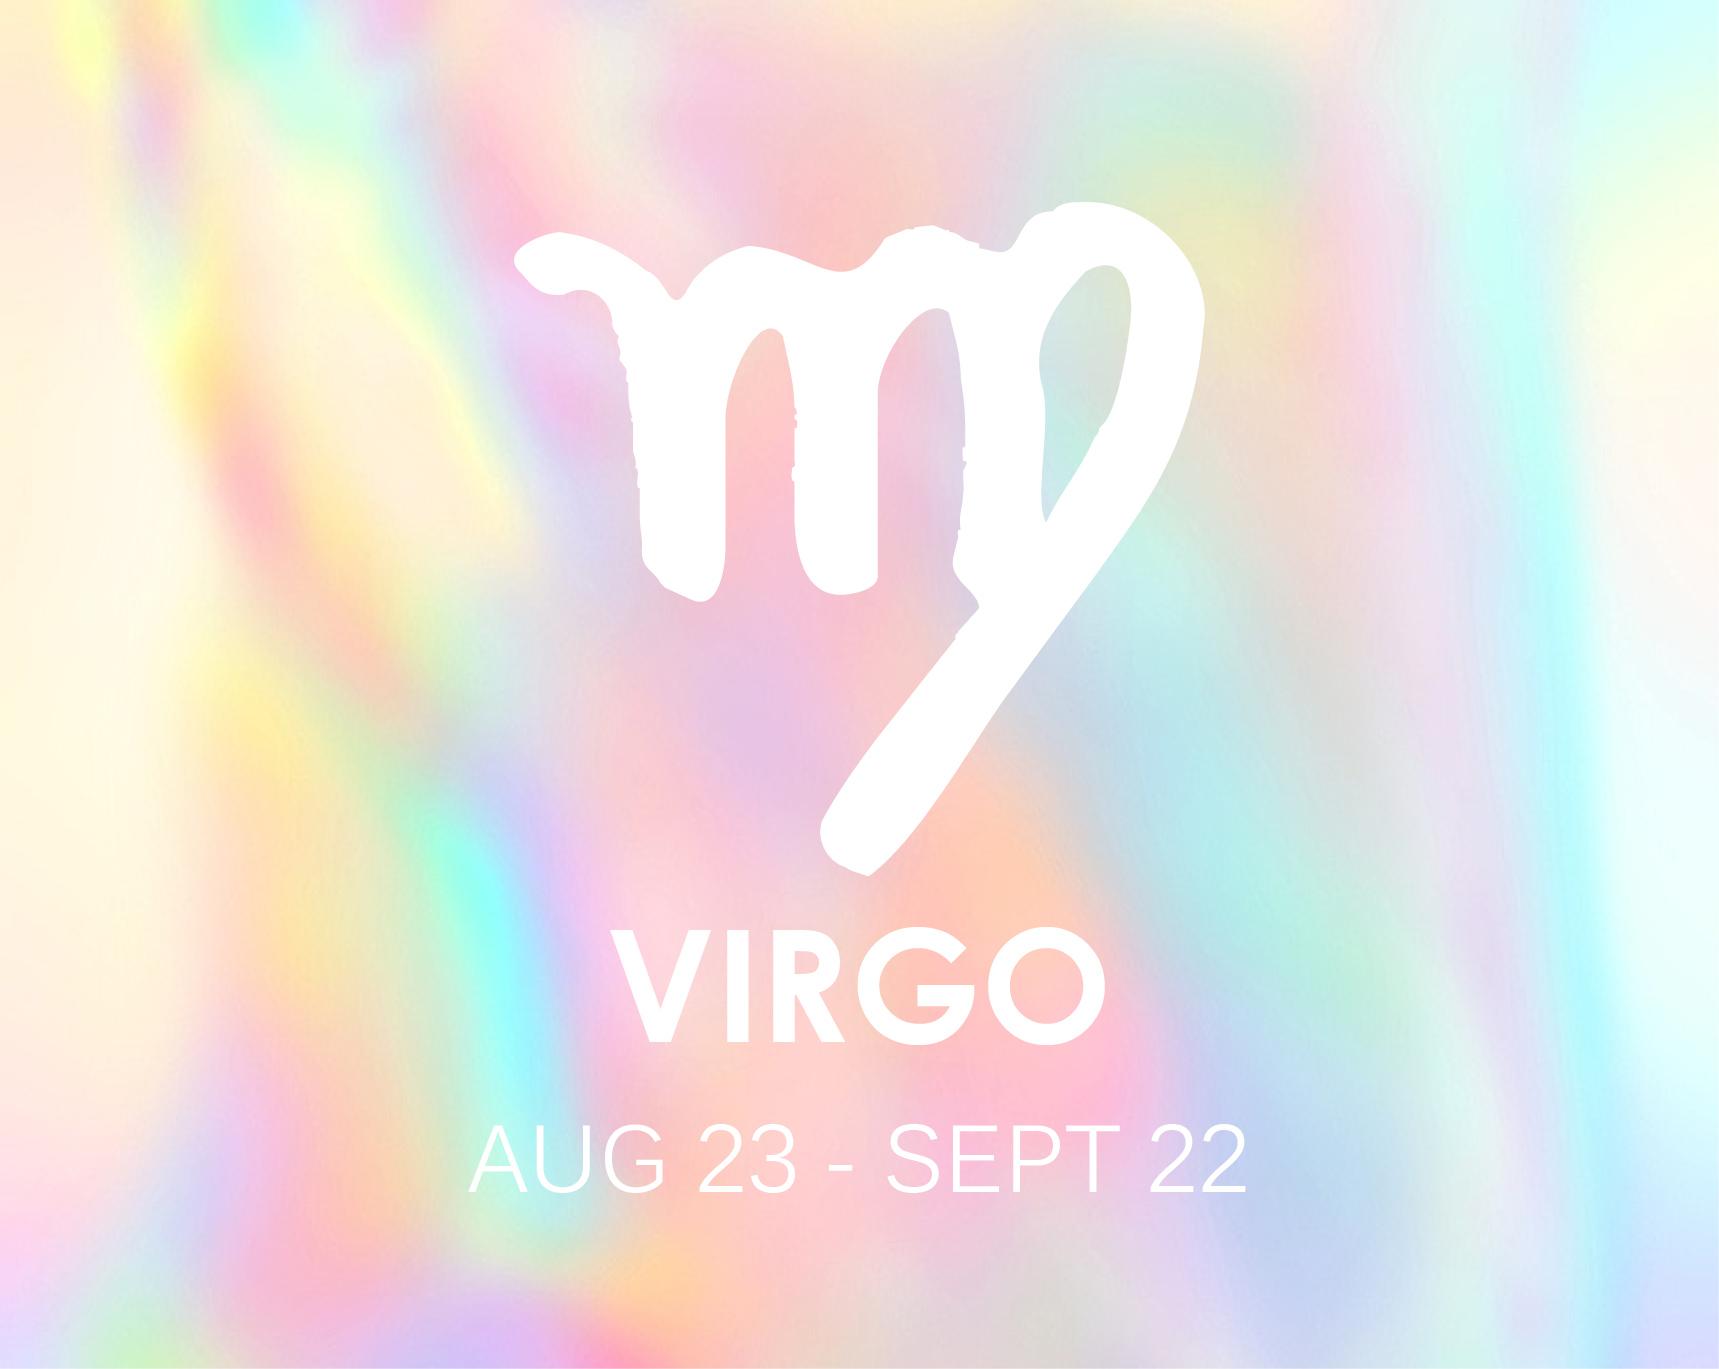 THE SAINTAugust 23rd - September 22ndModality: Mutable (Gemini, Virgo, Sagittarius + Pisces)Element: Earth (Taurus, Virgo + Capricorn)Planetary Ruler: Mercury -